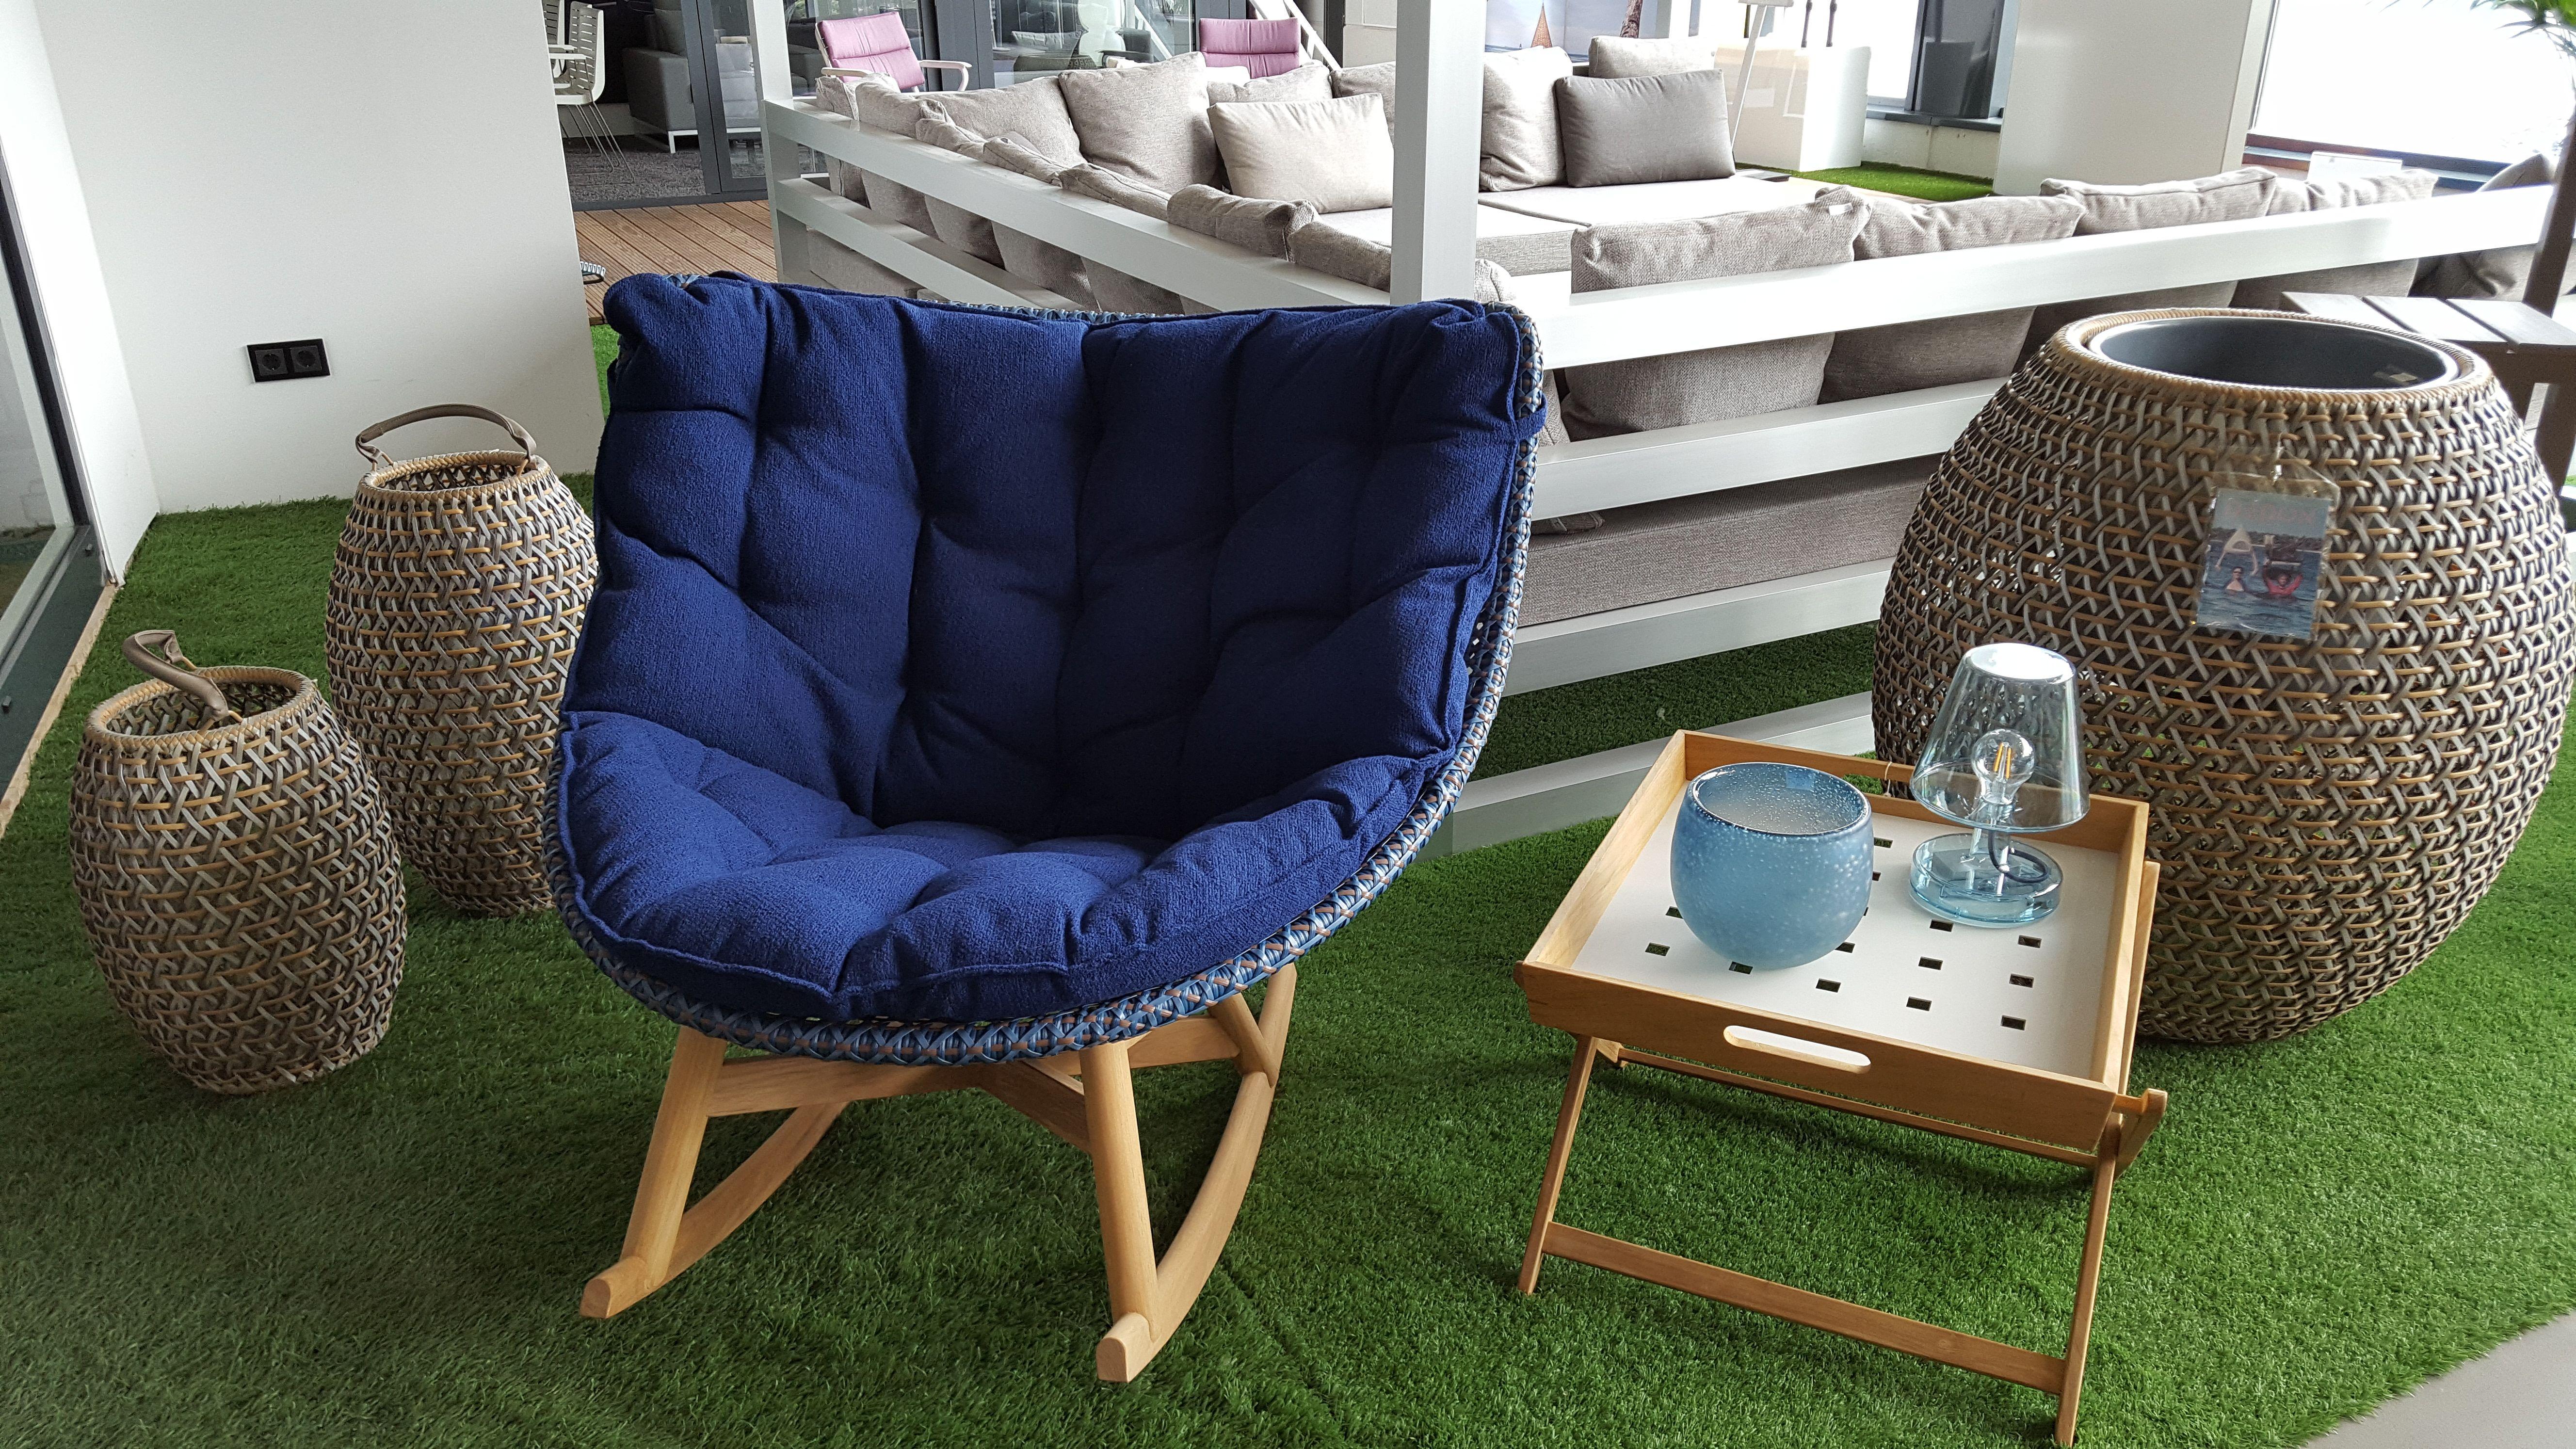 Rocking Chair MBRACE von Dedon | Dedon | Pinterest